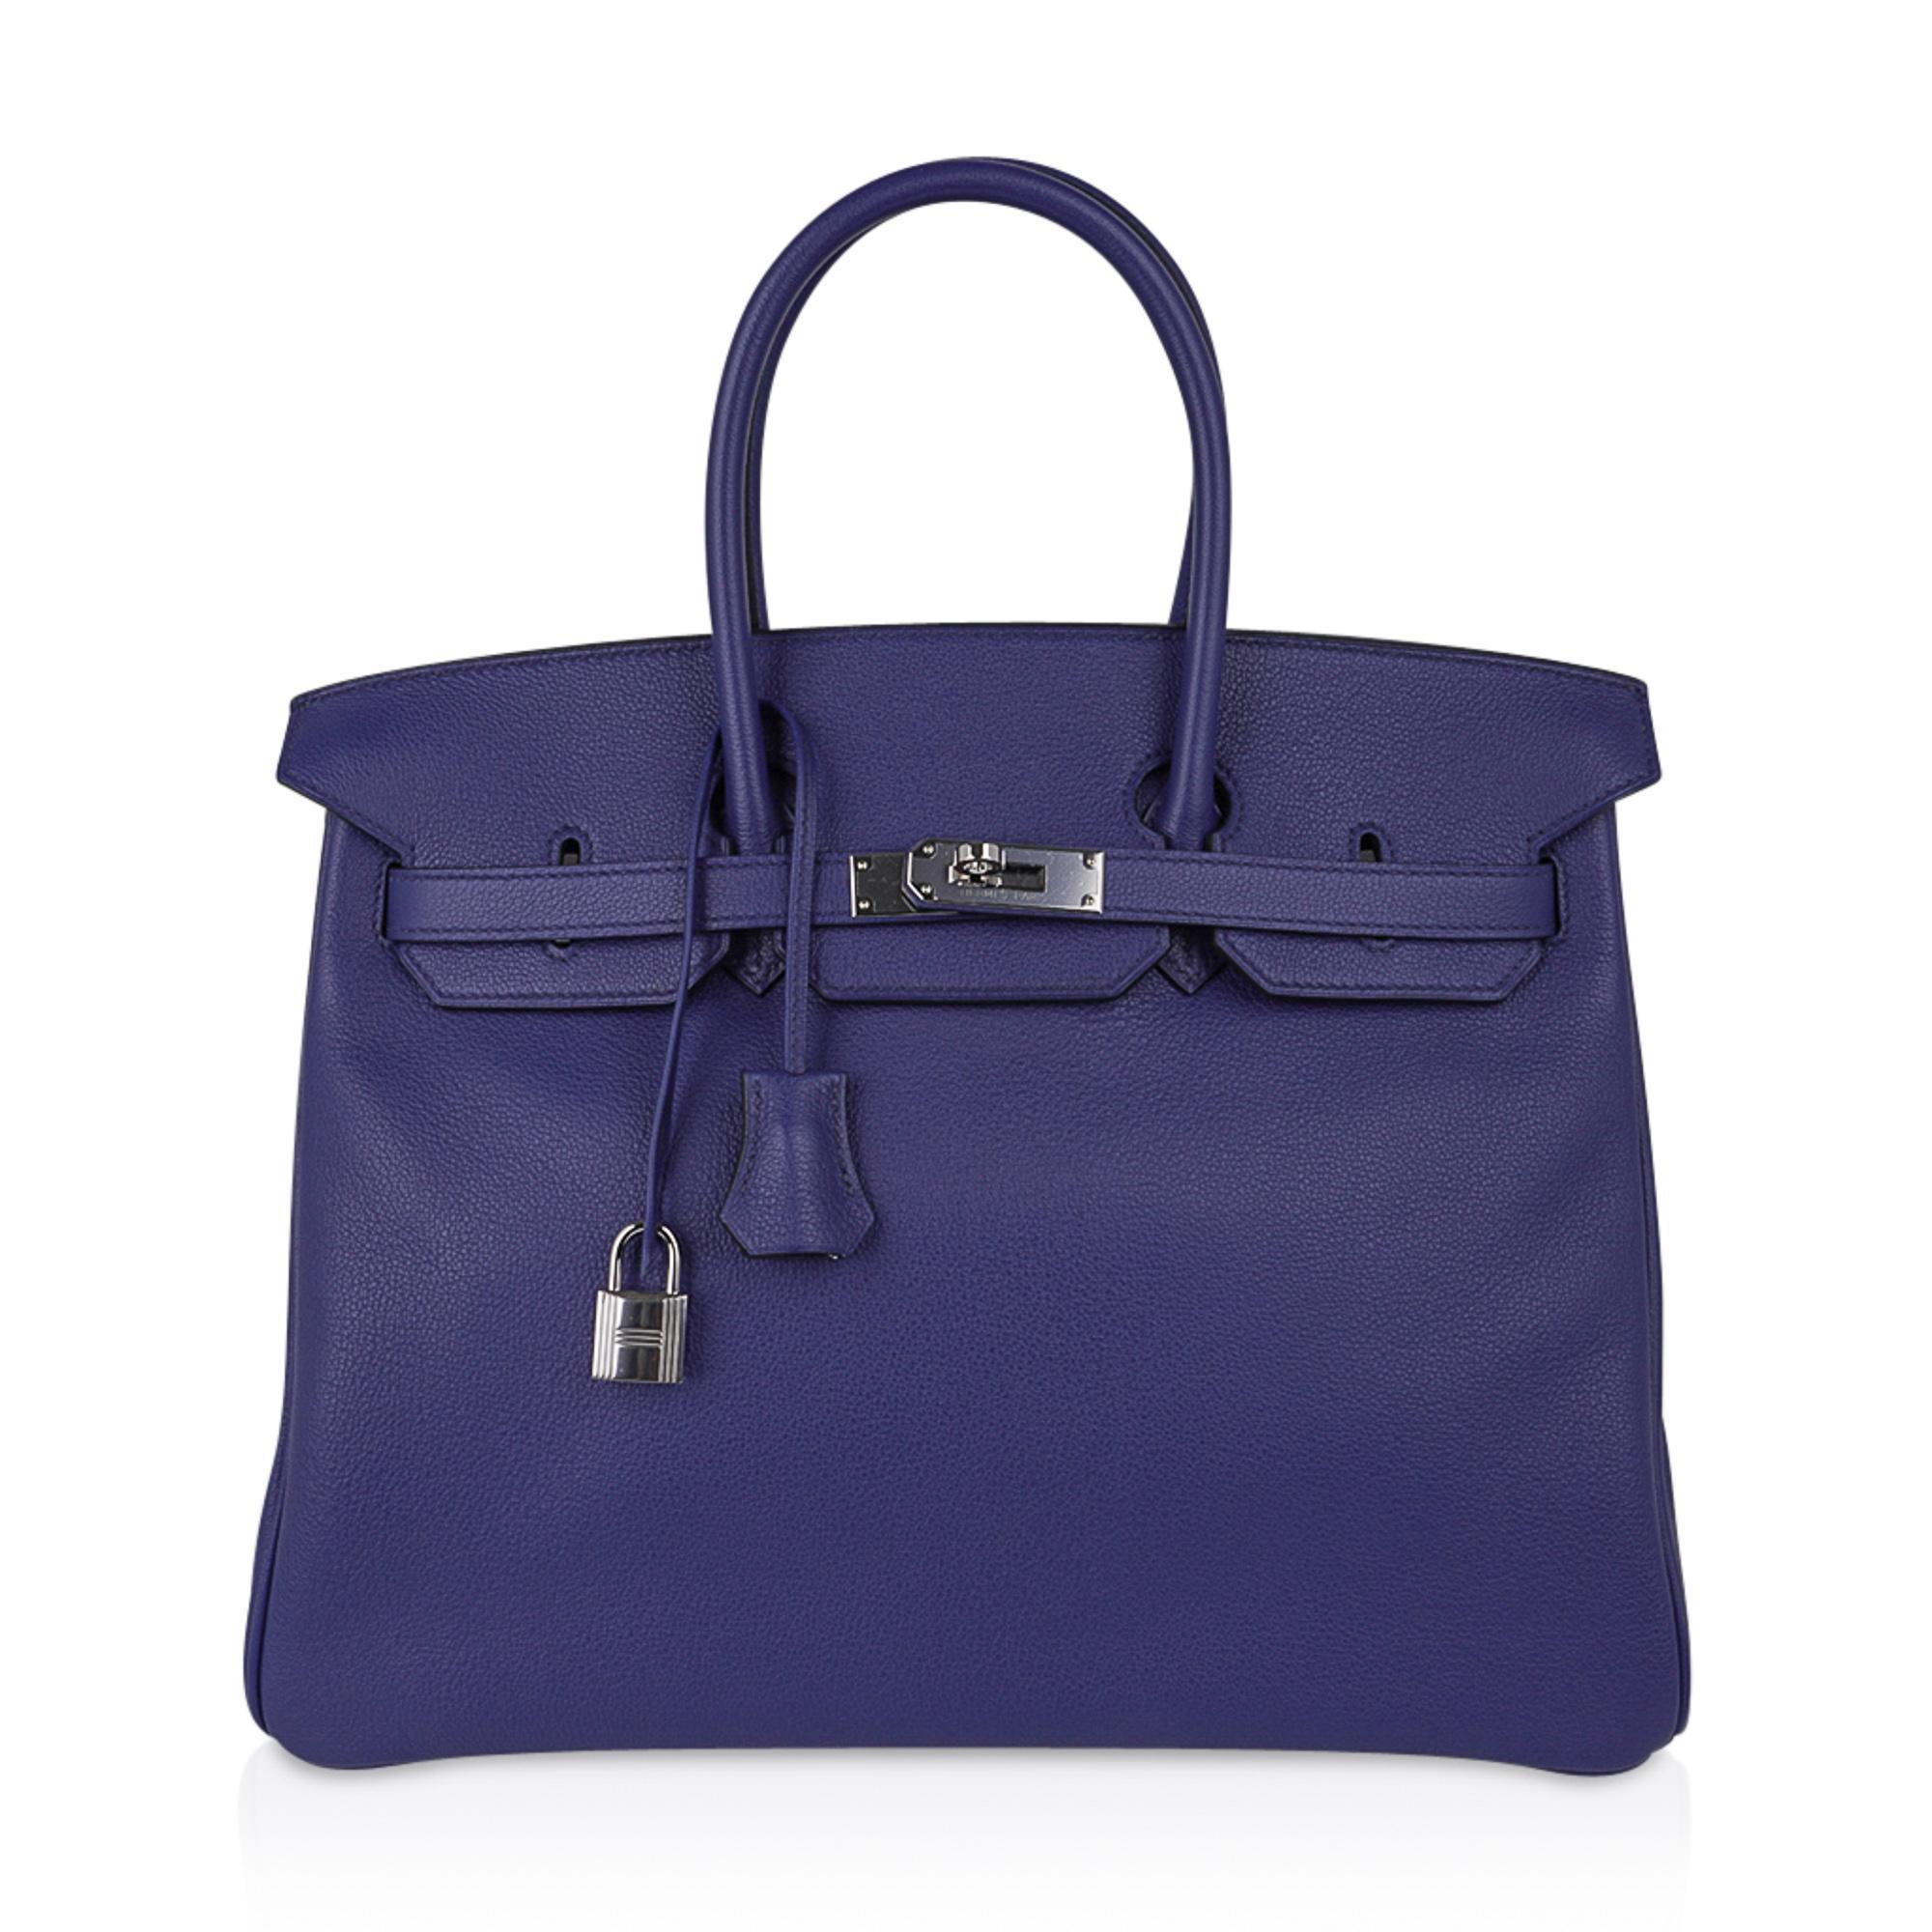 Hermes Birkin 35 Bag Blue Sapphire Limited Edition Toile Printed Sea Surf